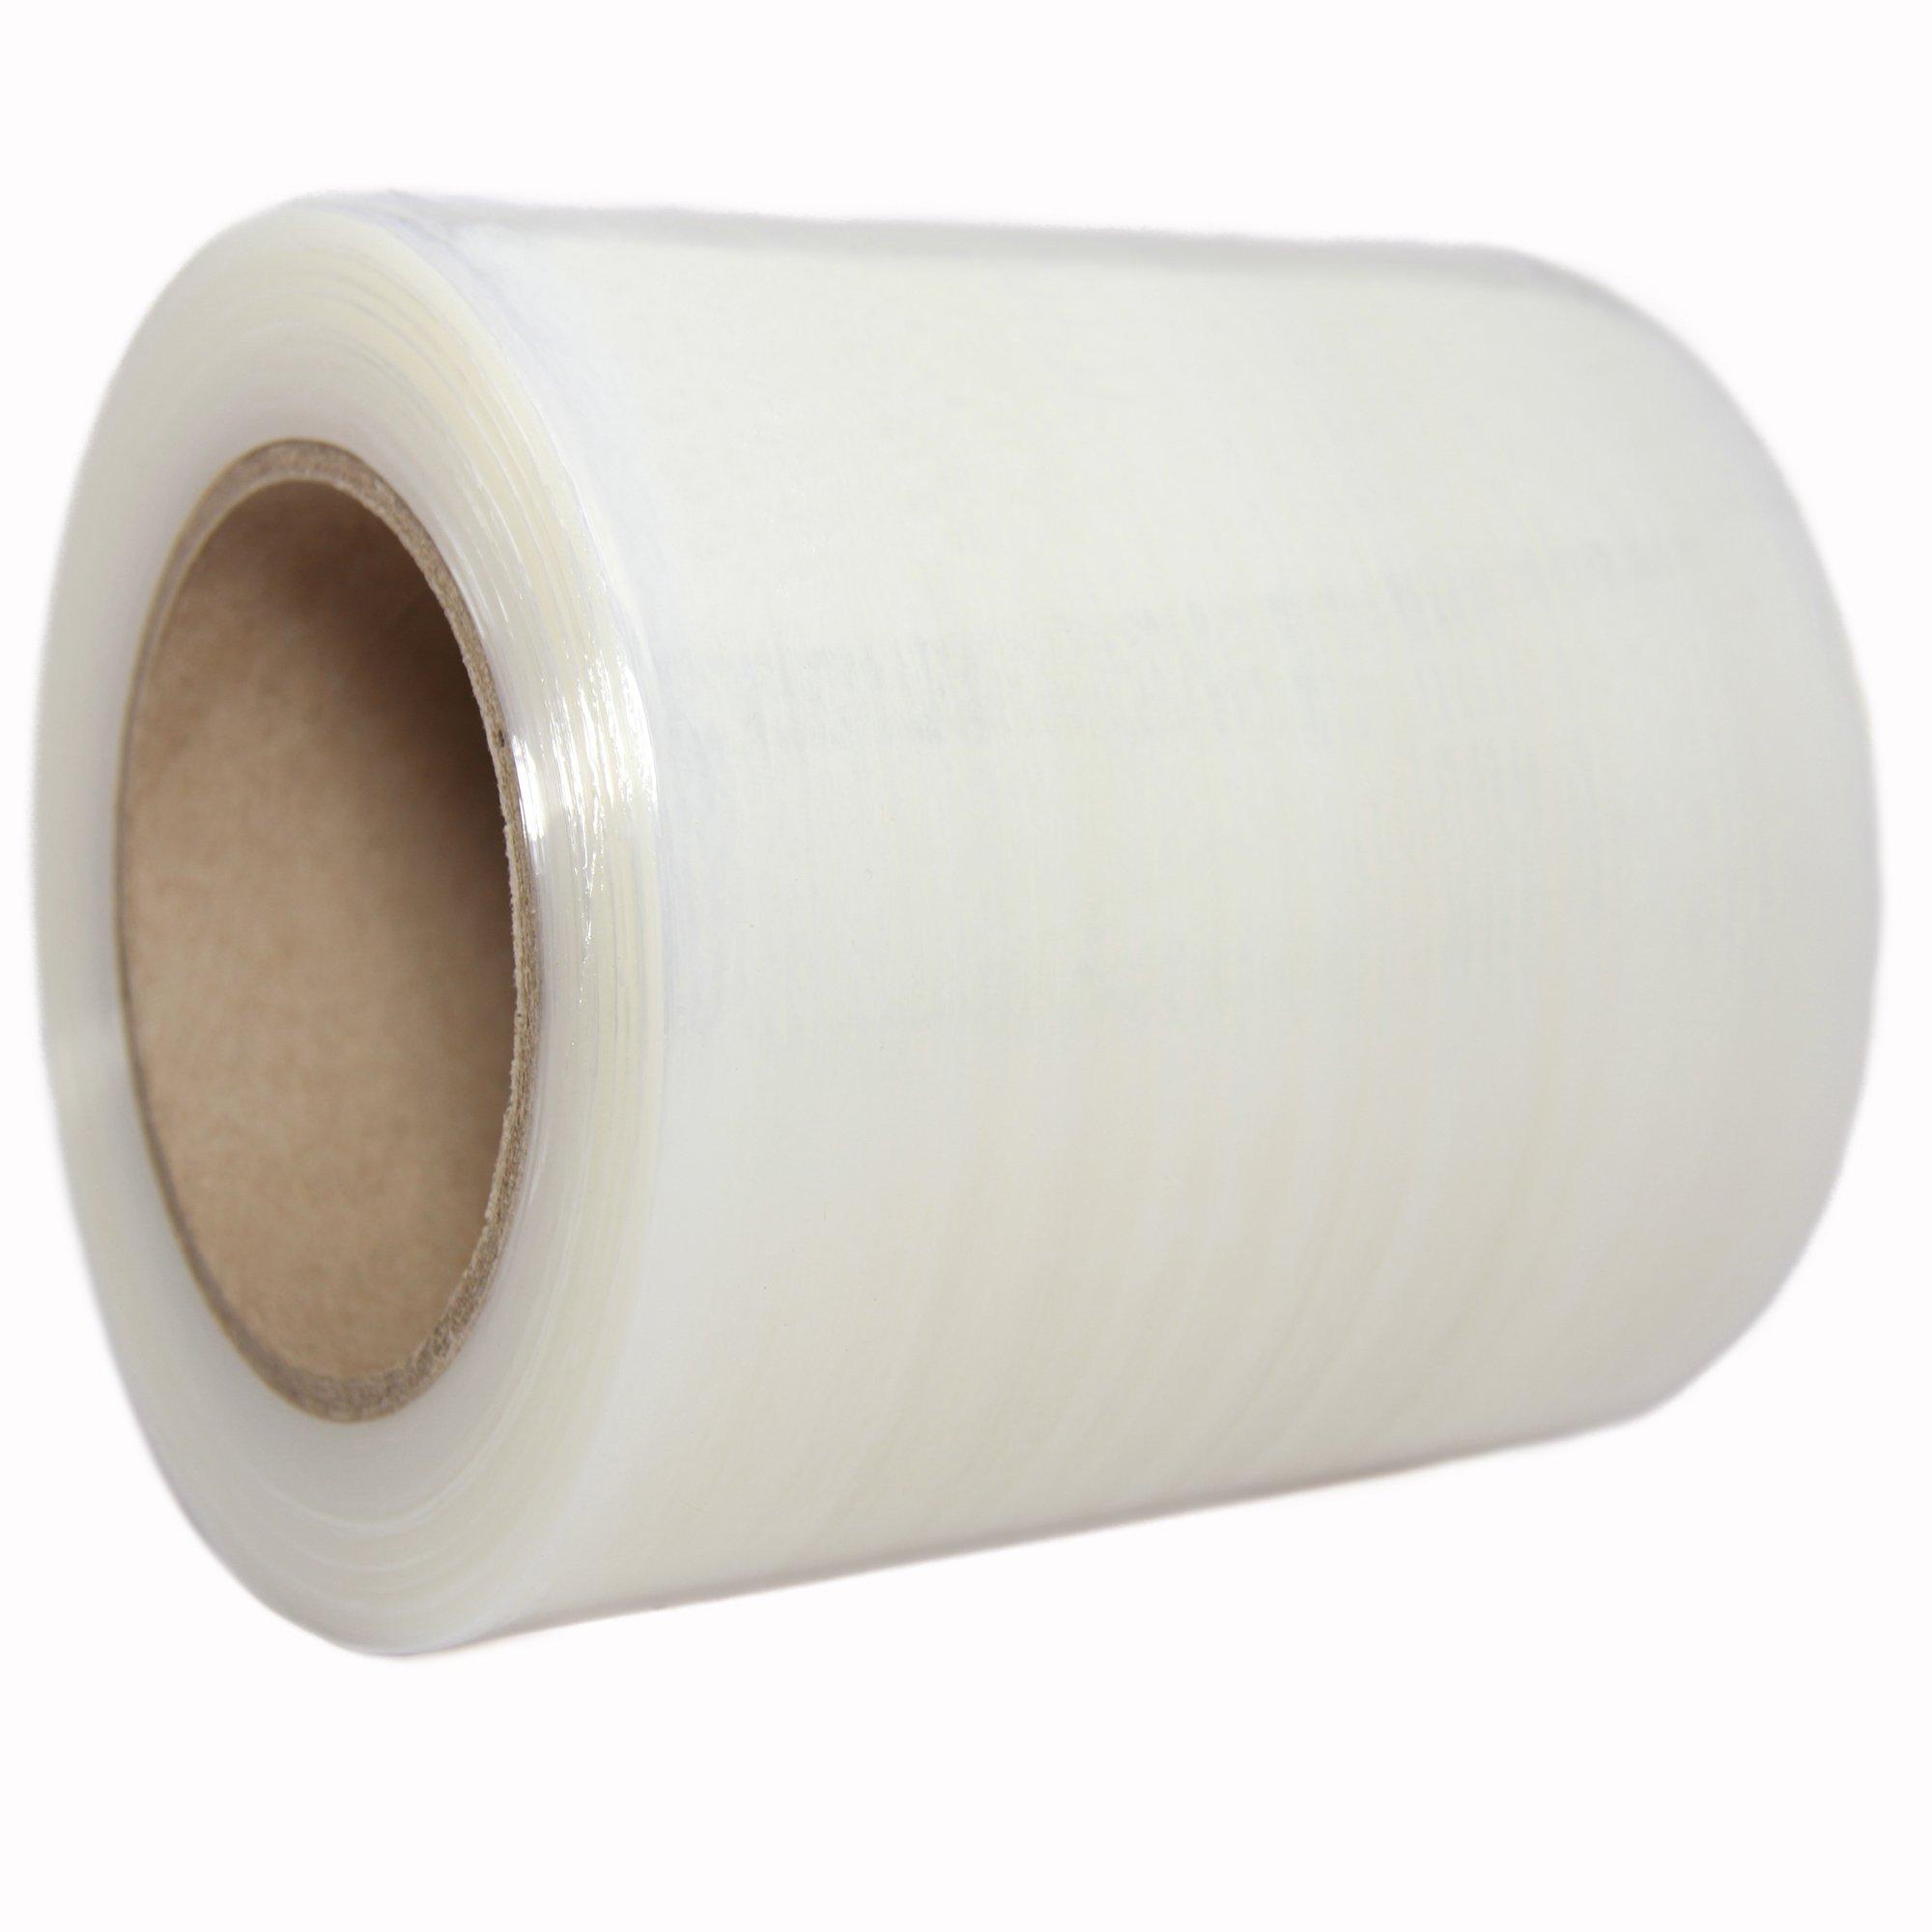 "TotalPack Shrink Mini Wrap: Stretch Film Plastic Wrap 1 Pack - Industrial Strength Hand Stretch Wrap, 5"" x 1,000 FT, 80 Gauge Shrink Film / Pallet Wrap"